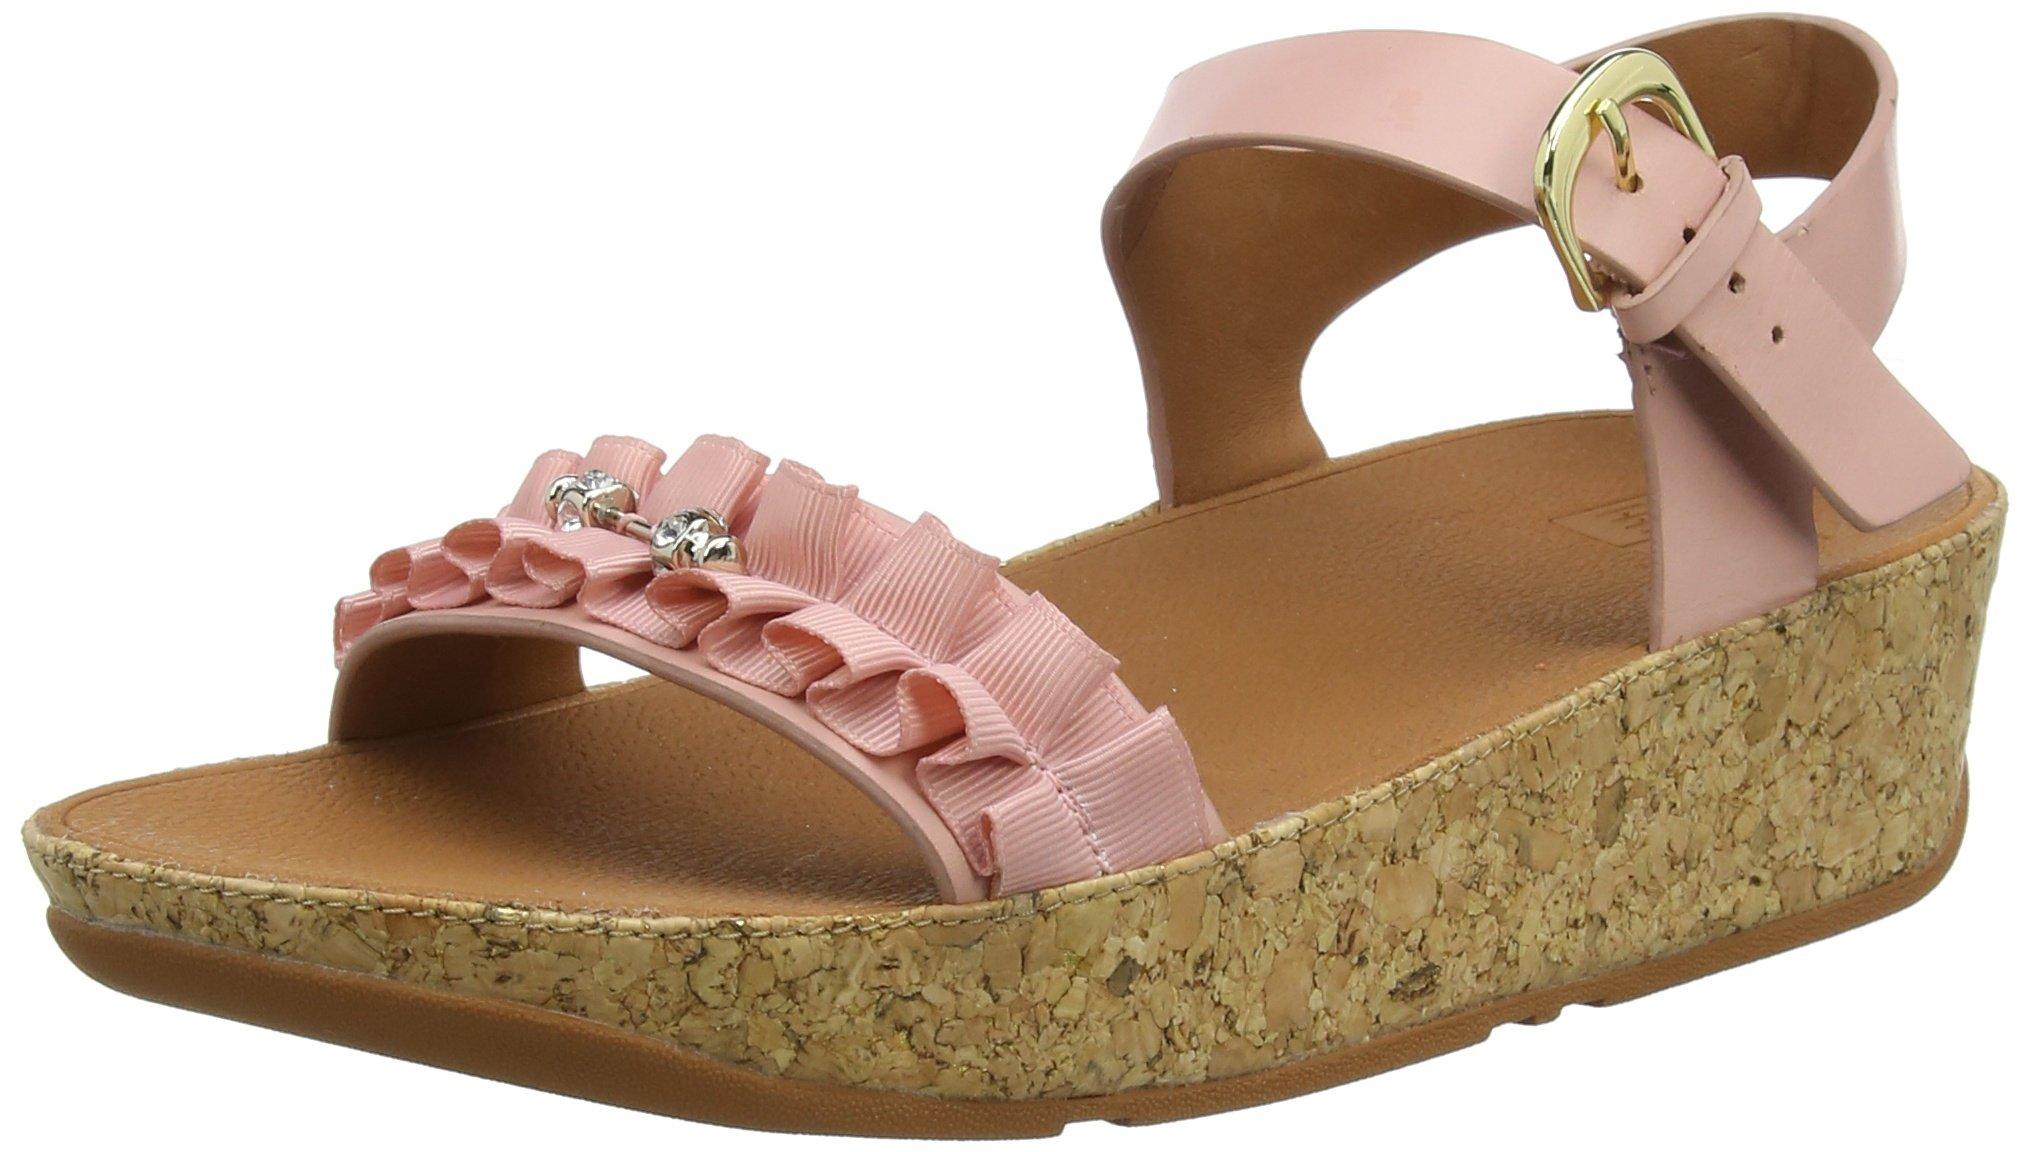 SandalsFemmeRosedusky Pink Back Fitflop Eu 53538 Ruffle strap Nv8wnOm0